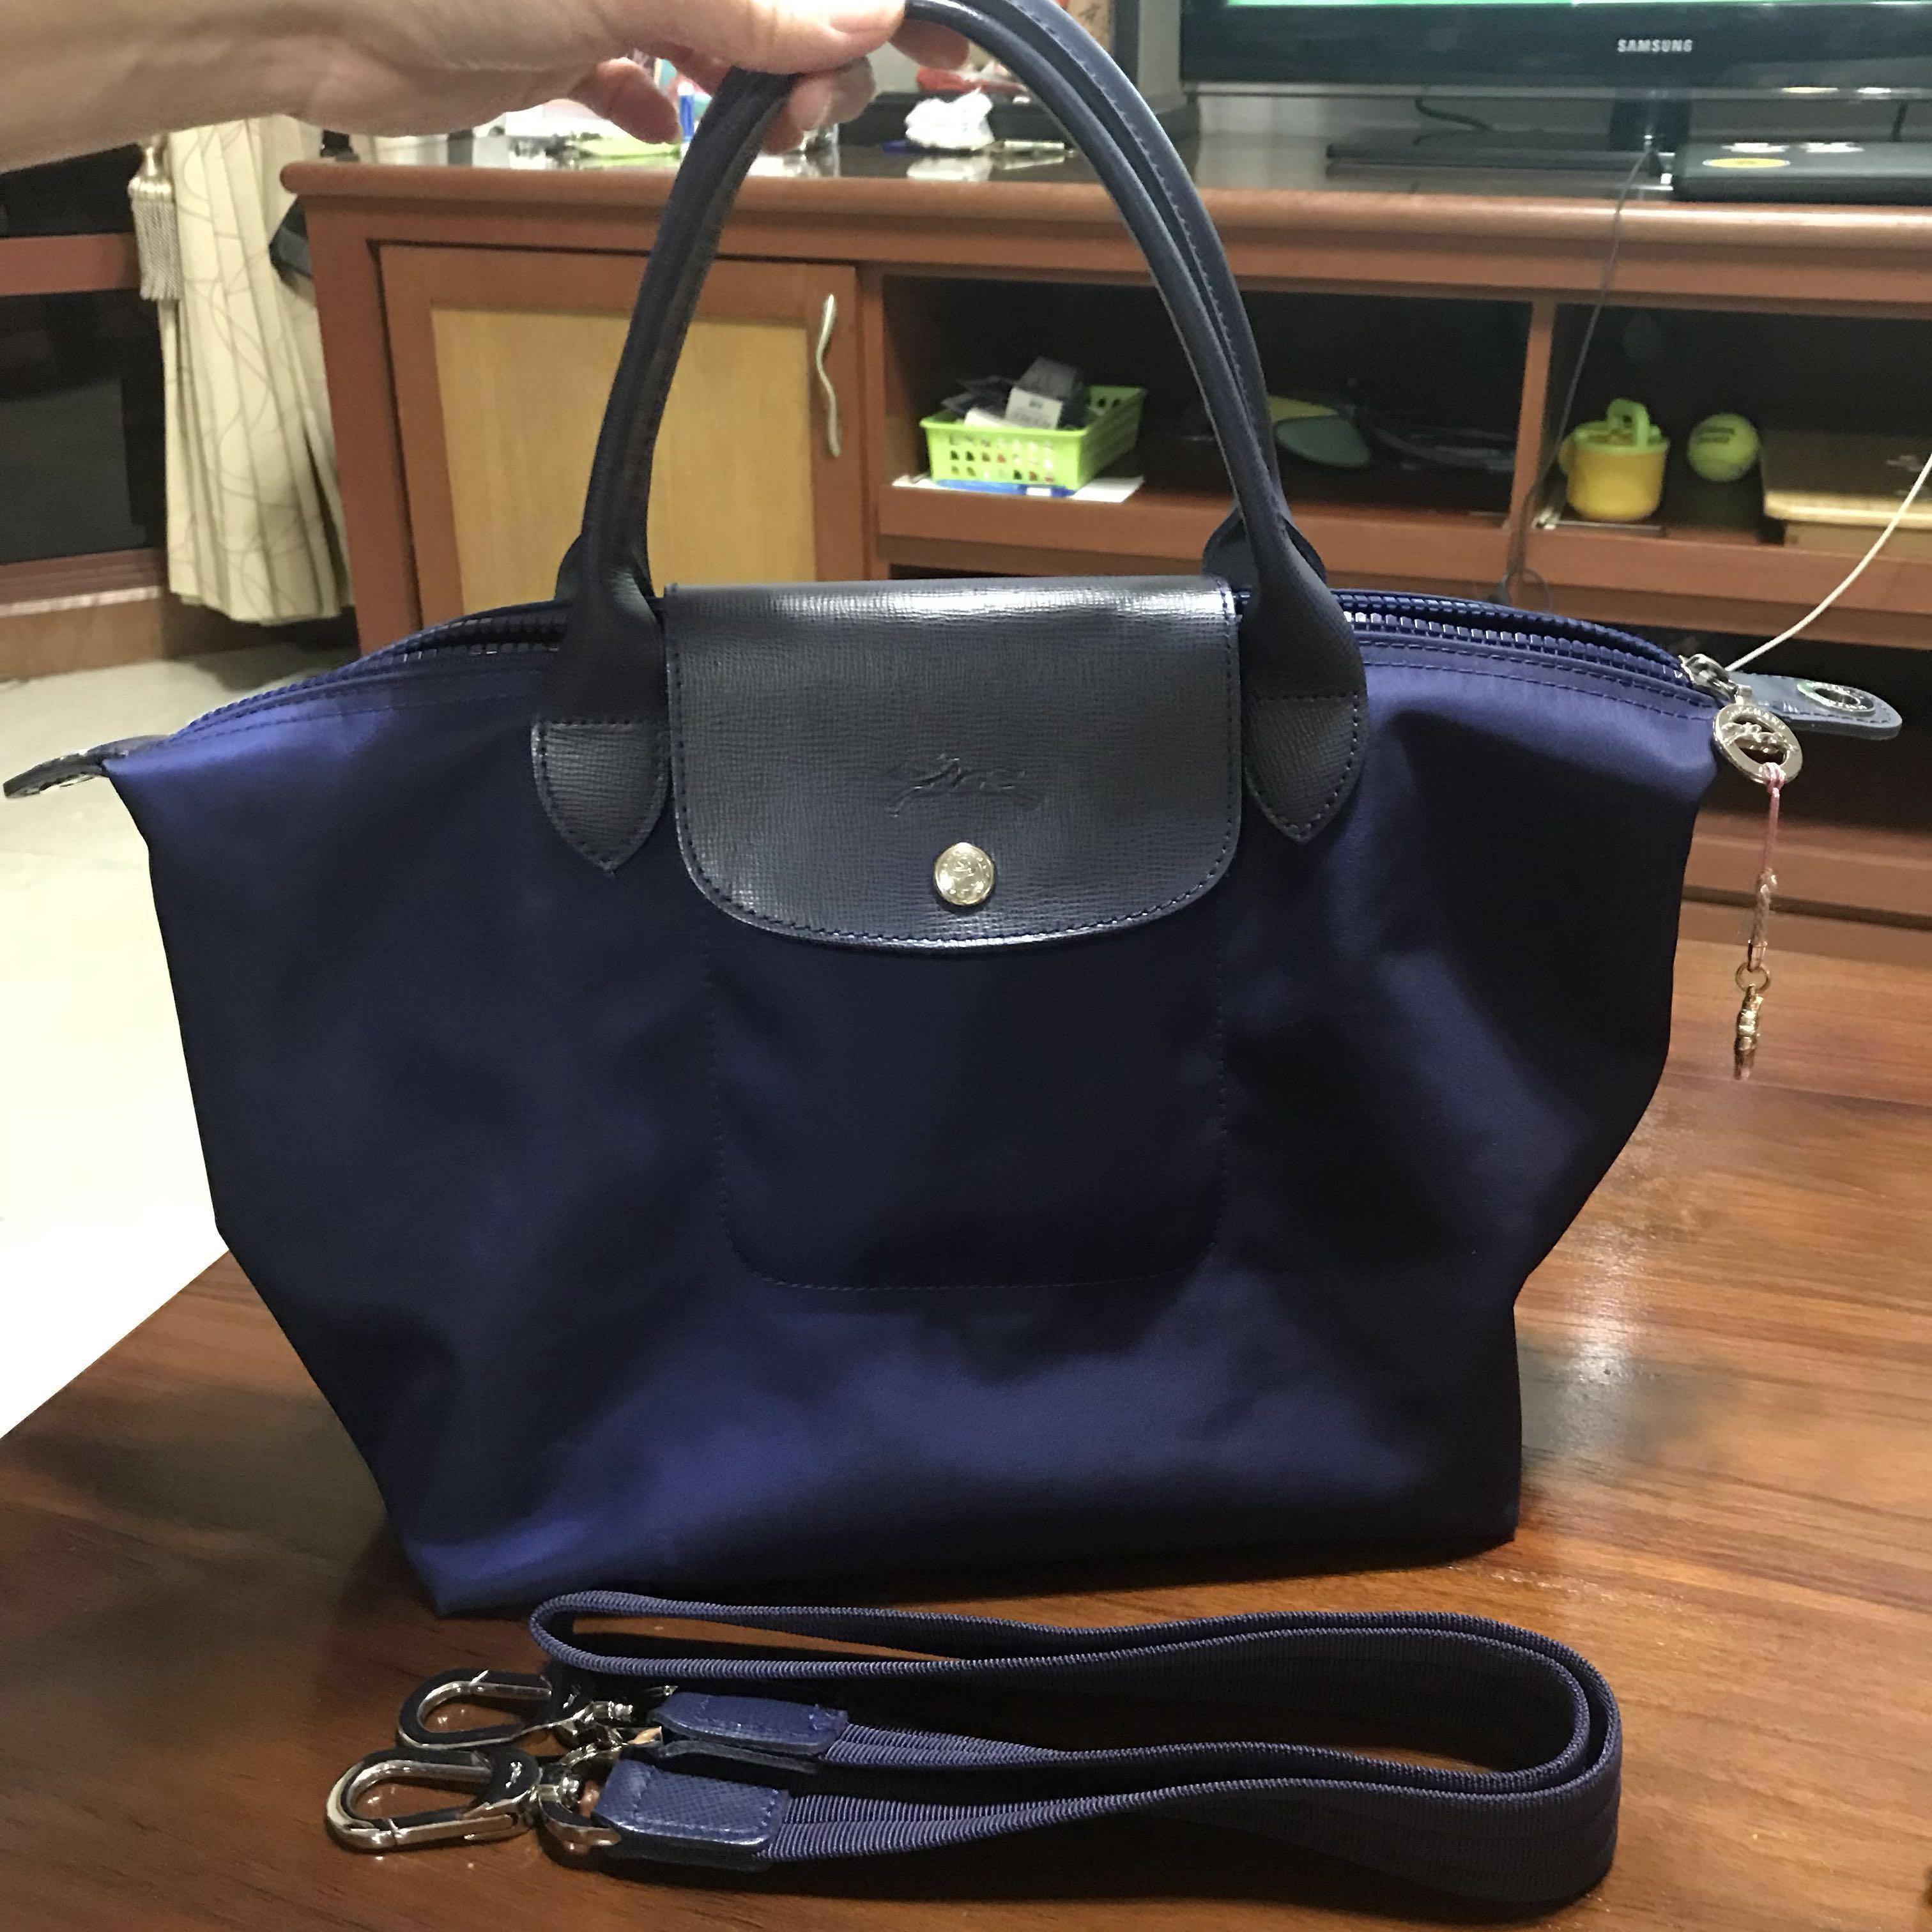 69114cd4c32 Authentic longchamp le pliage Neo medium navy blue, Women's Fashion, Bags &  Wallets, Handbags on Carousell